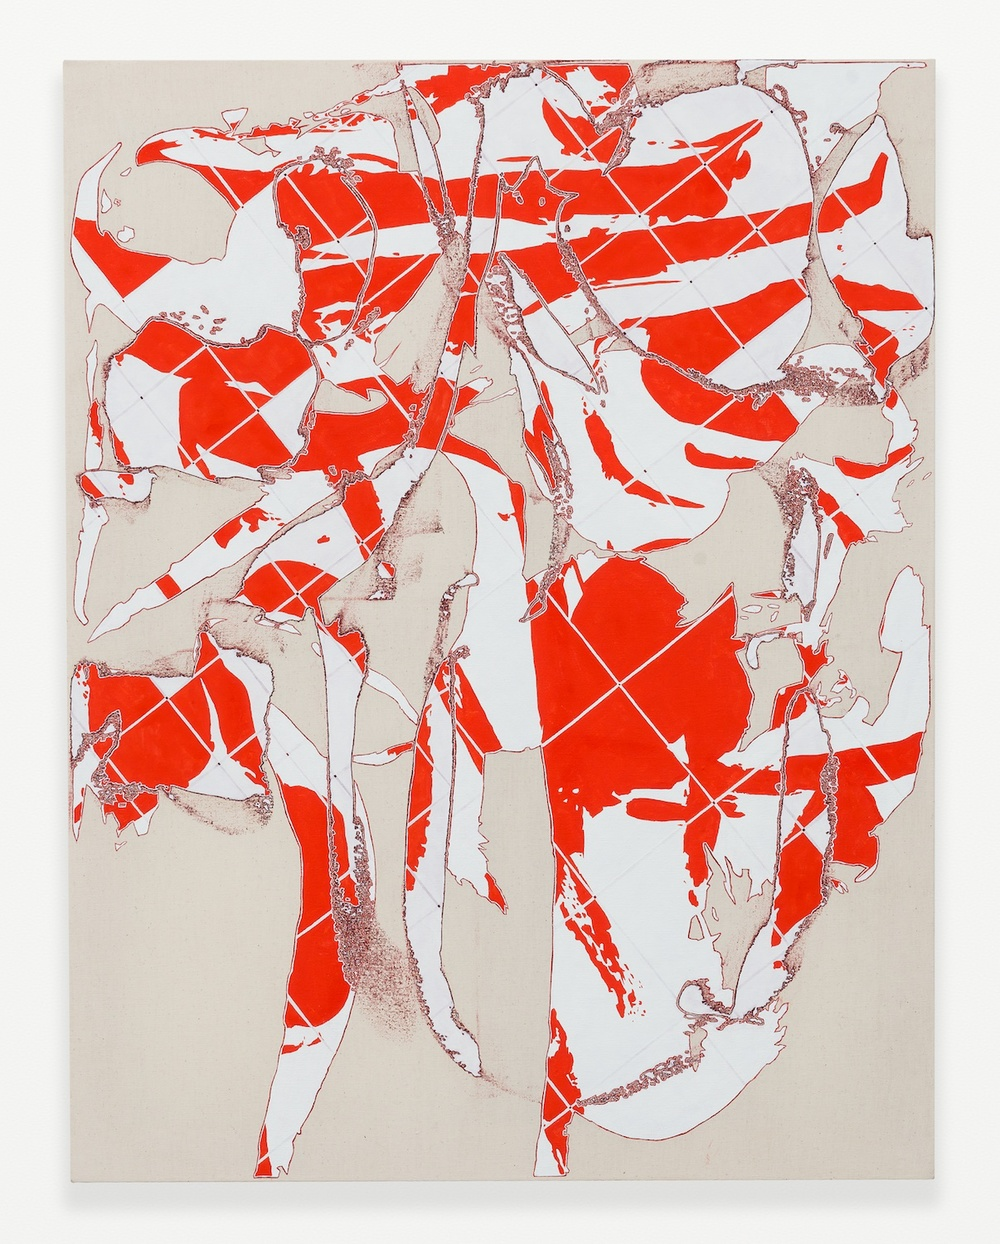 Zak Prekop  Two Grids (Three Reds)  2014 Oil on canvas 35h x 27w in ZP305